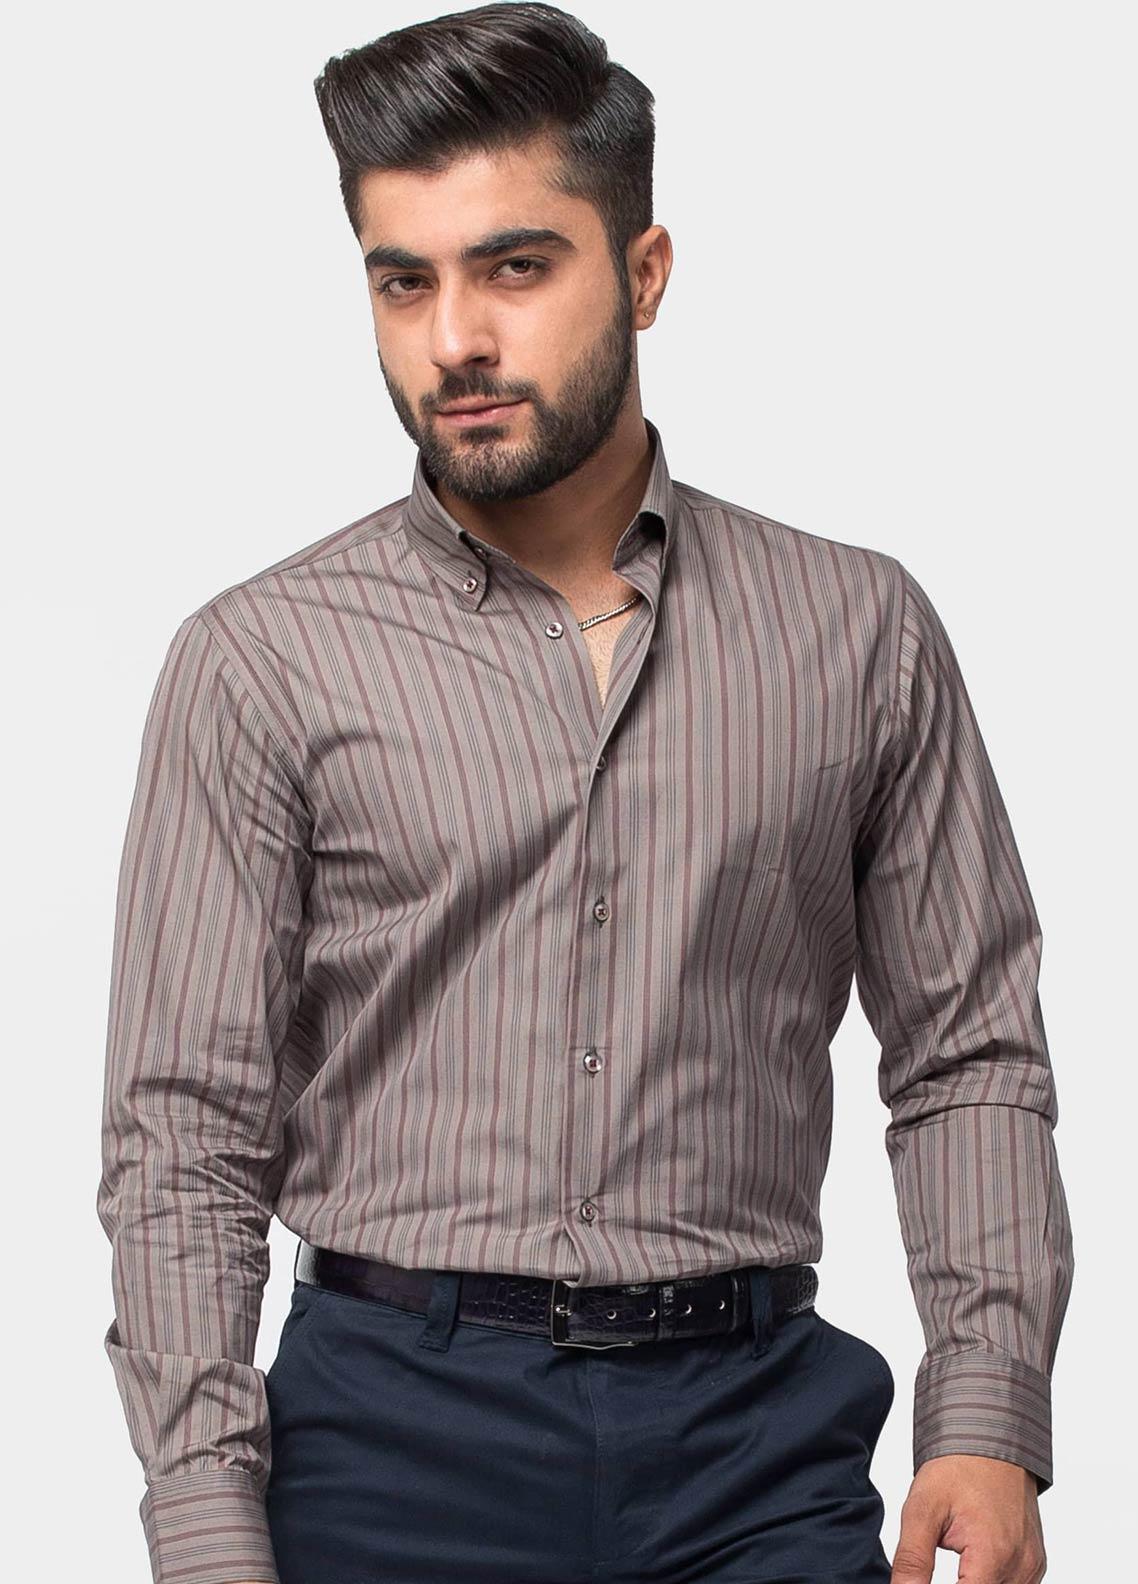 Brumano Cotton Formal Men Shirts -  BM20LS Umber Brown Striped Shirt